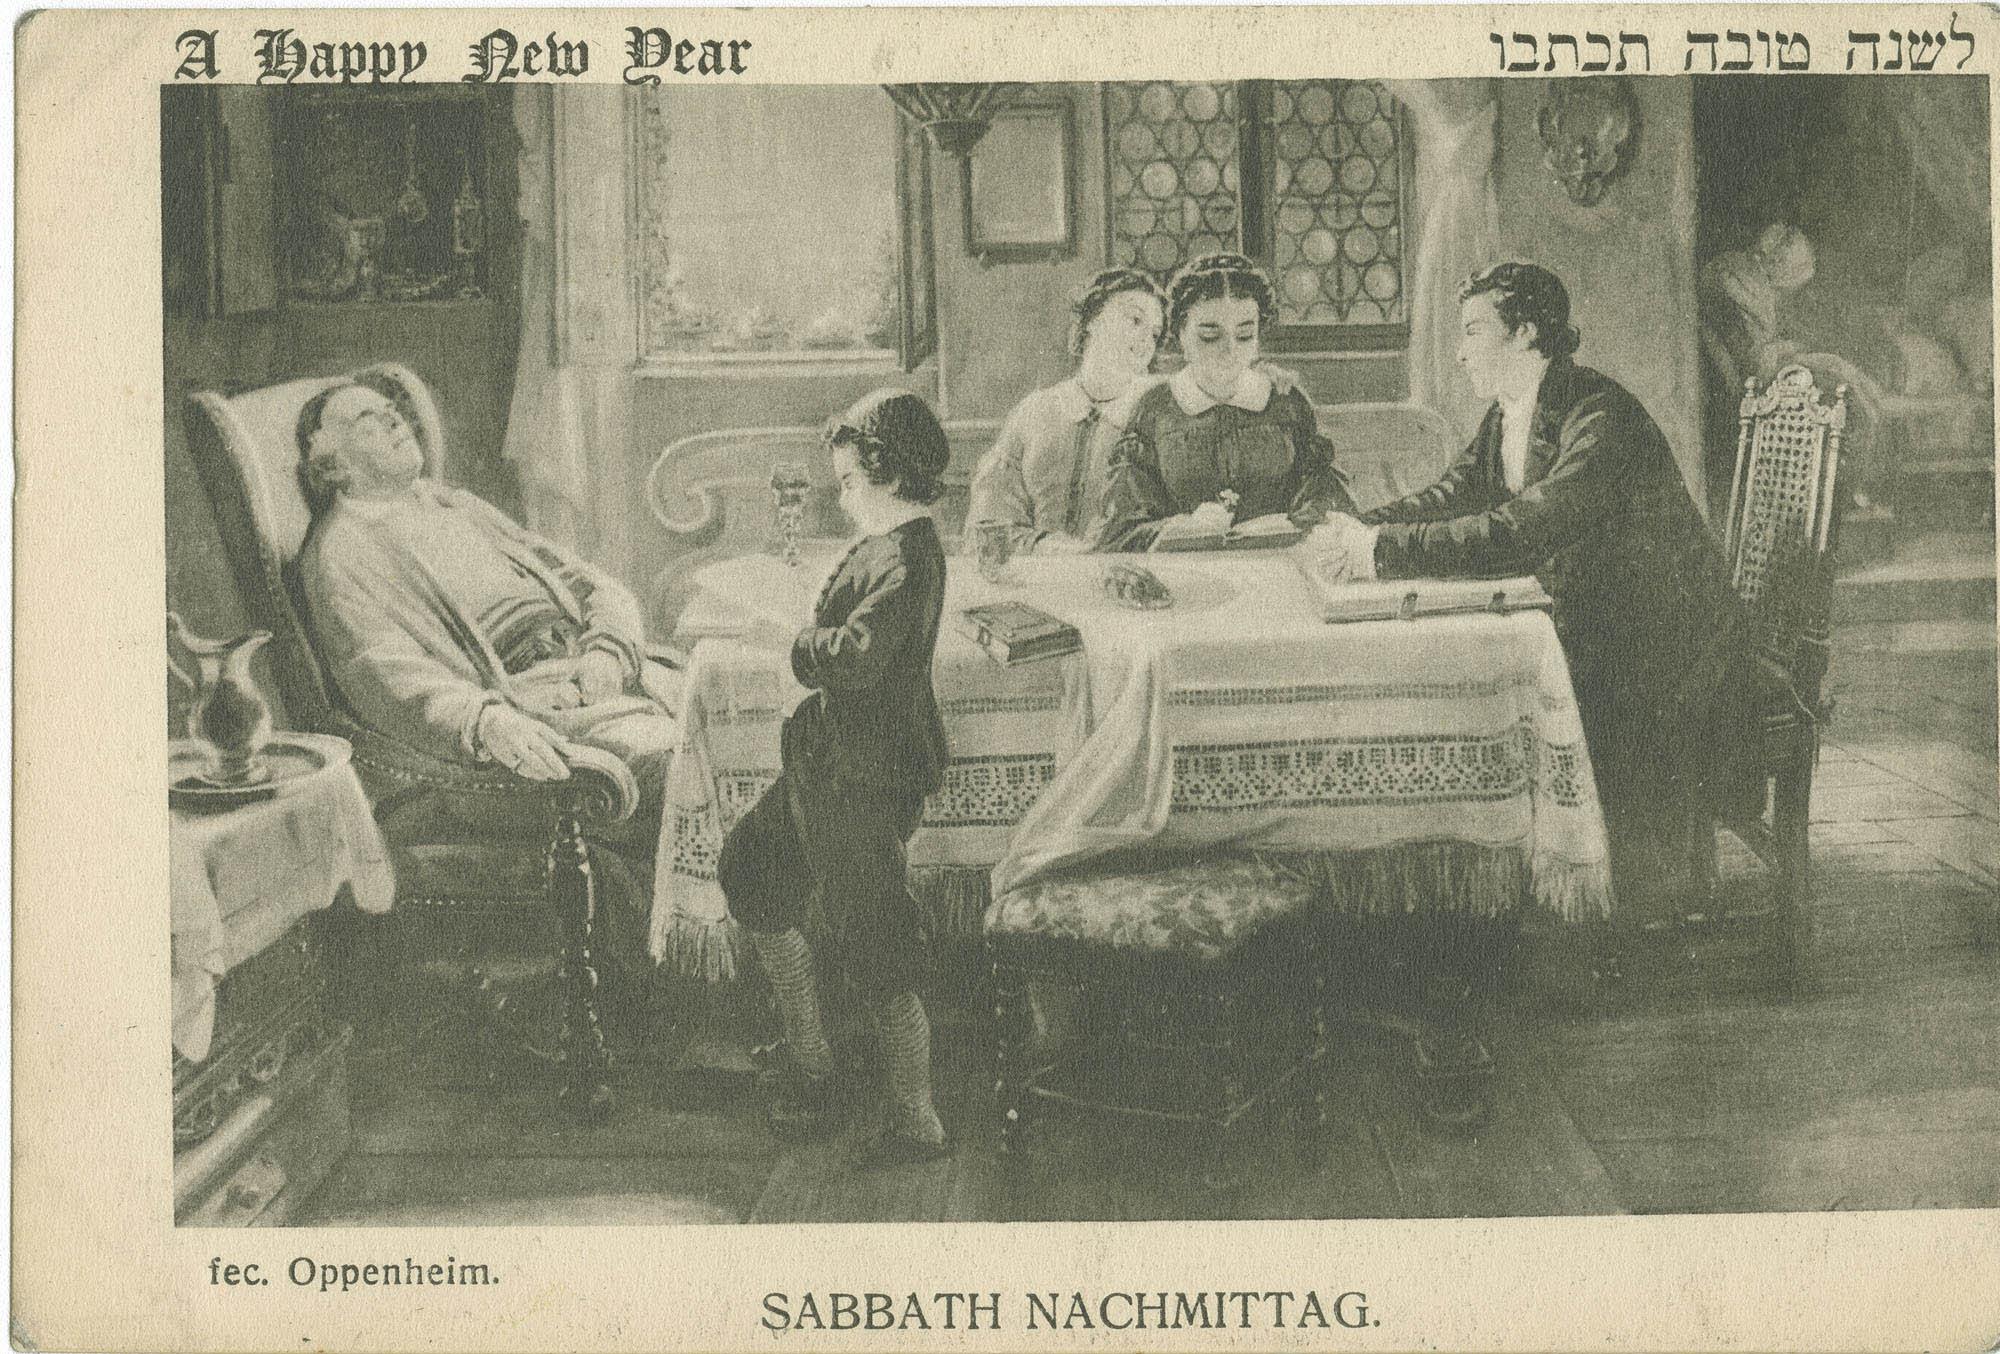 Sabbath Nachmittag